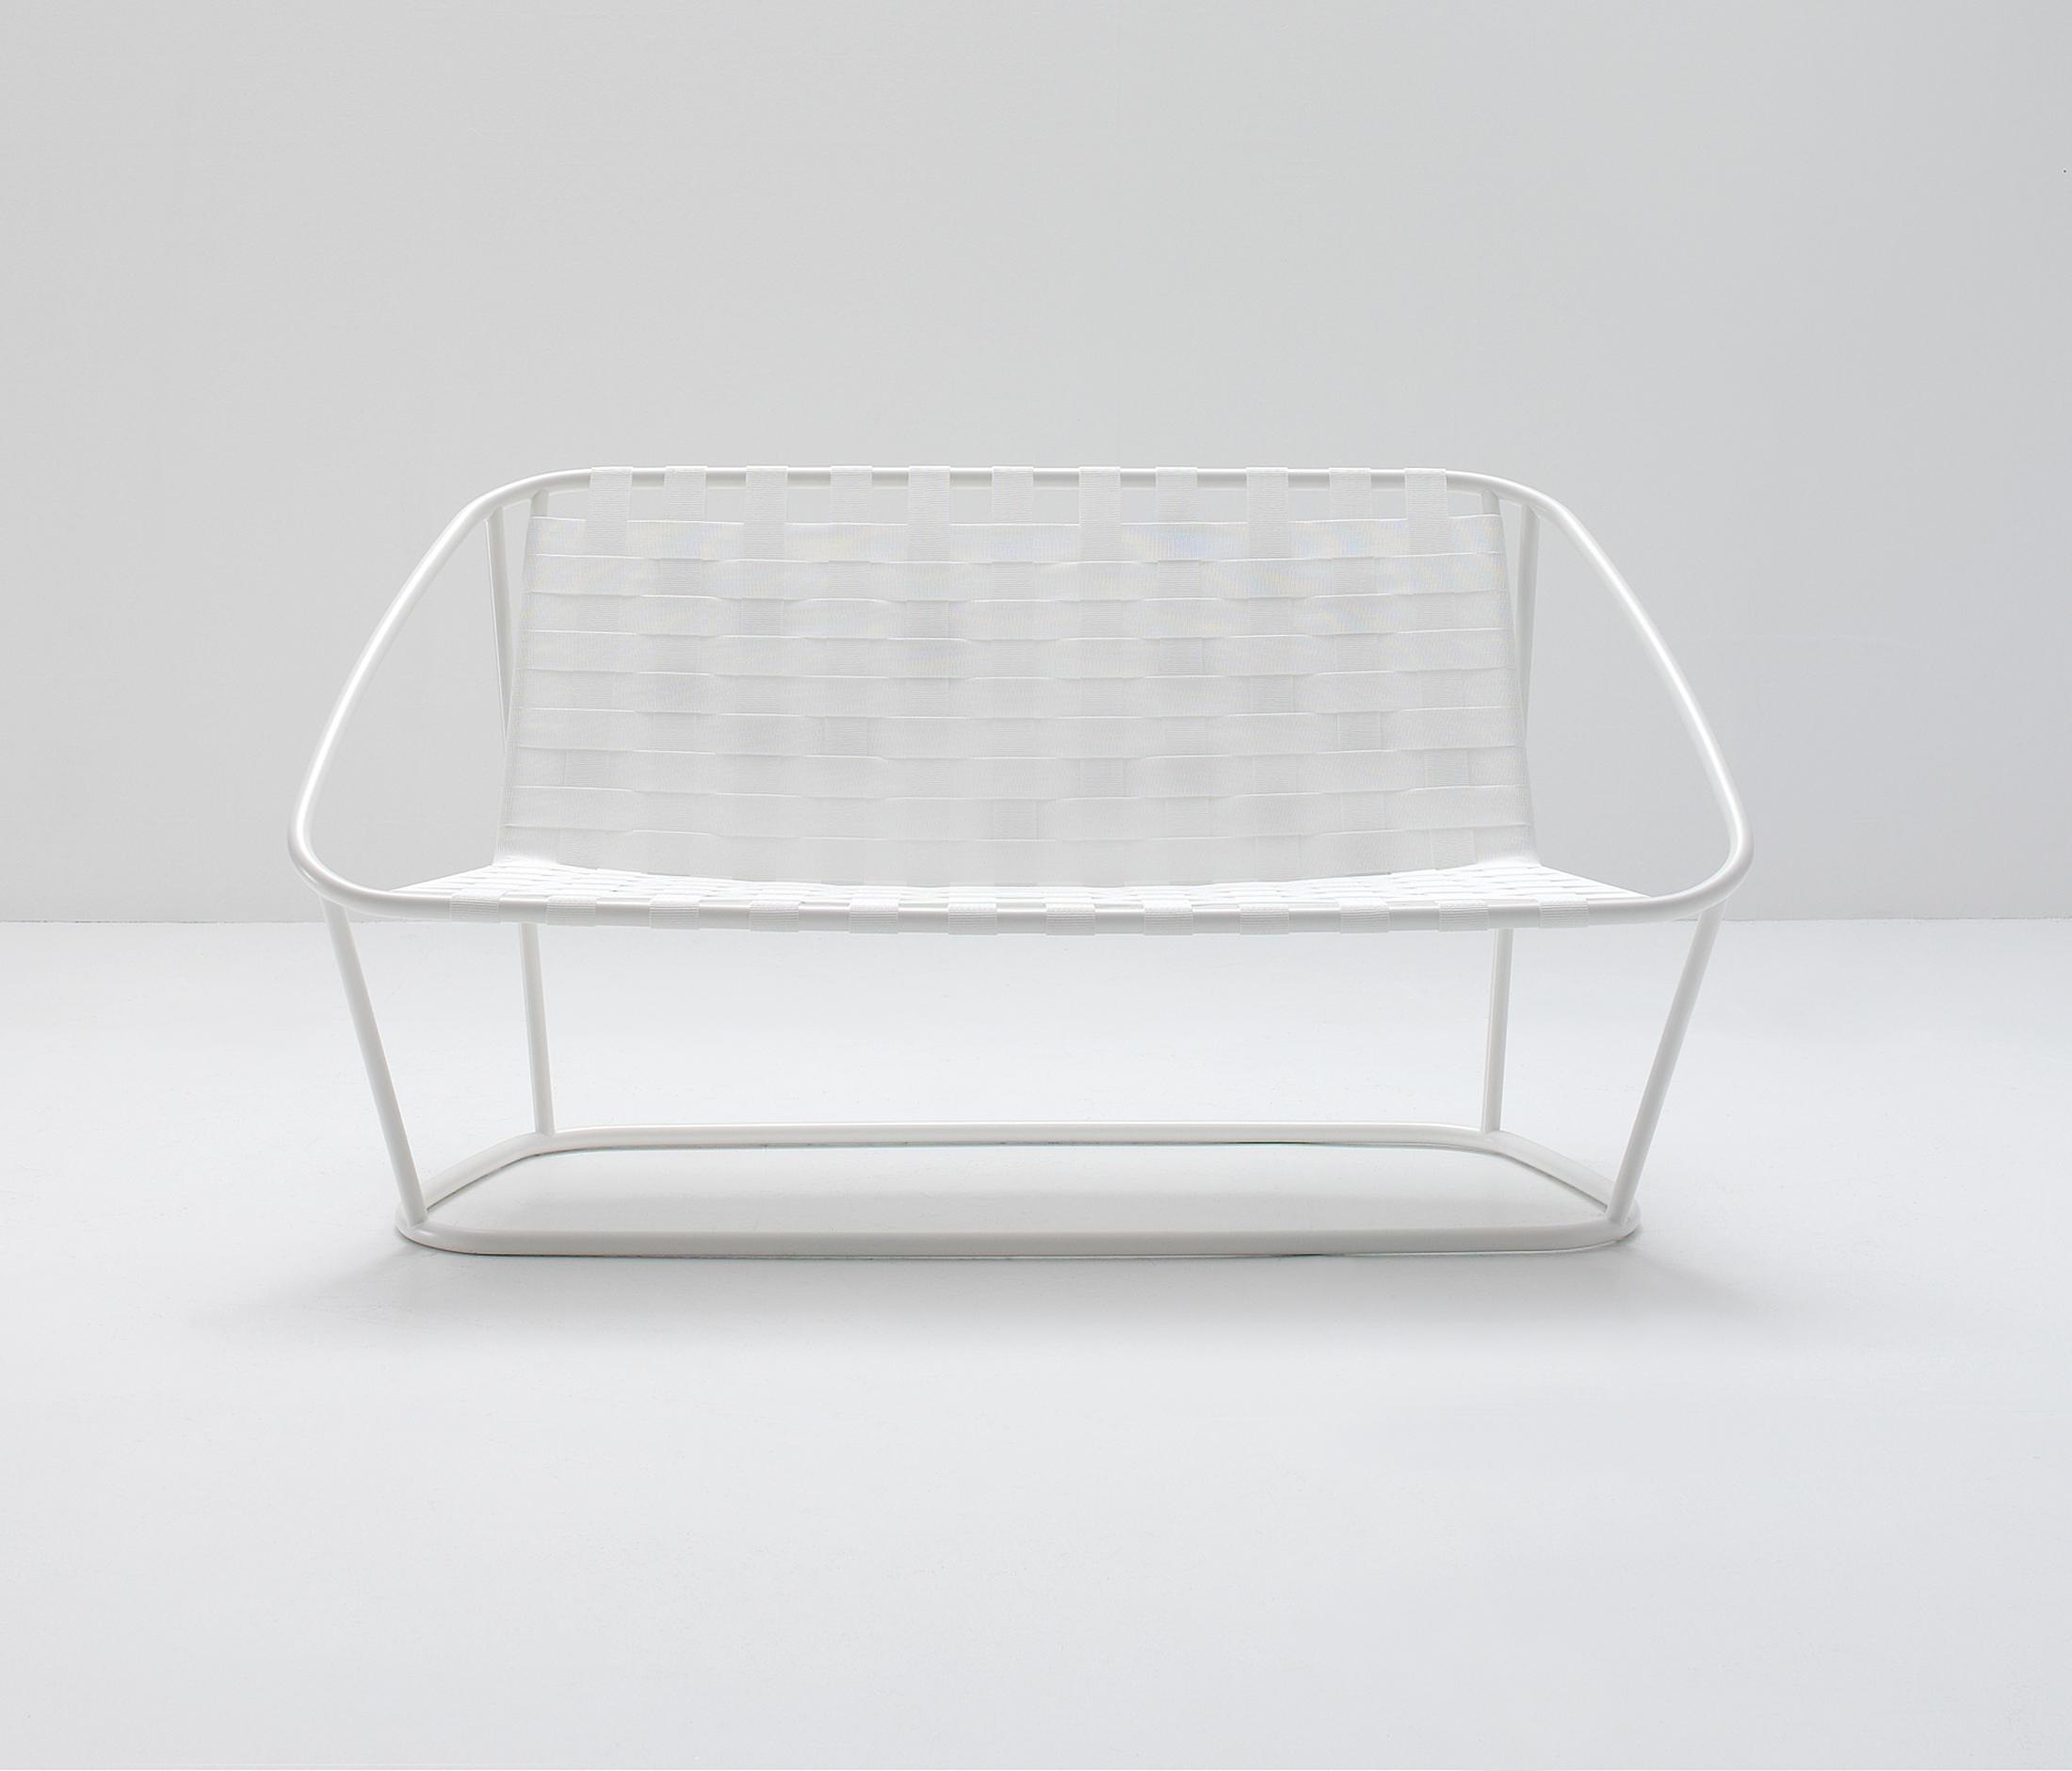 cloud sofa schmal gartensofas von arflex architonic. Black Bedroom Furniture Sets. Home Design Ideas